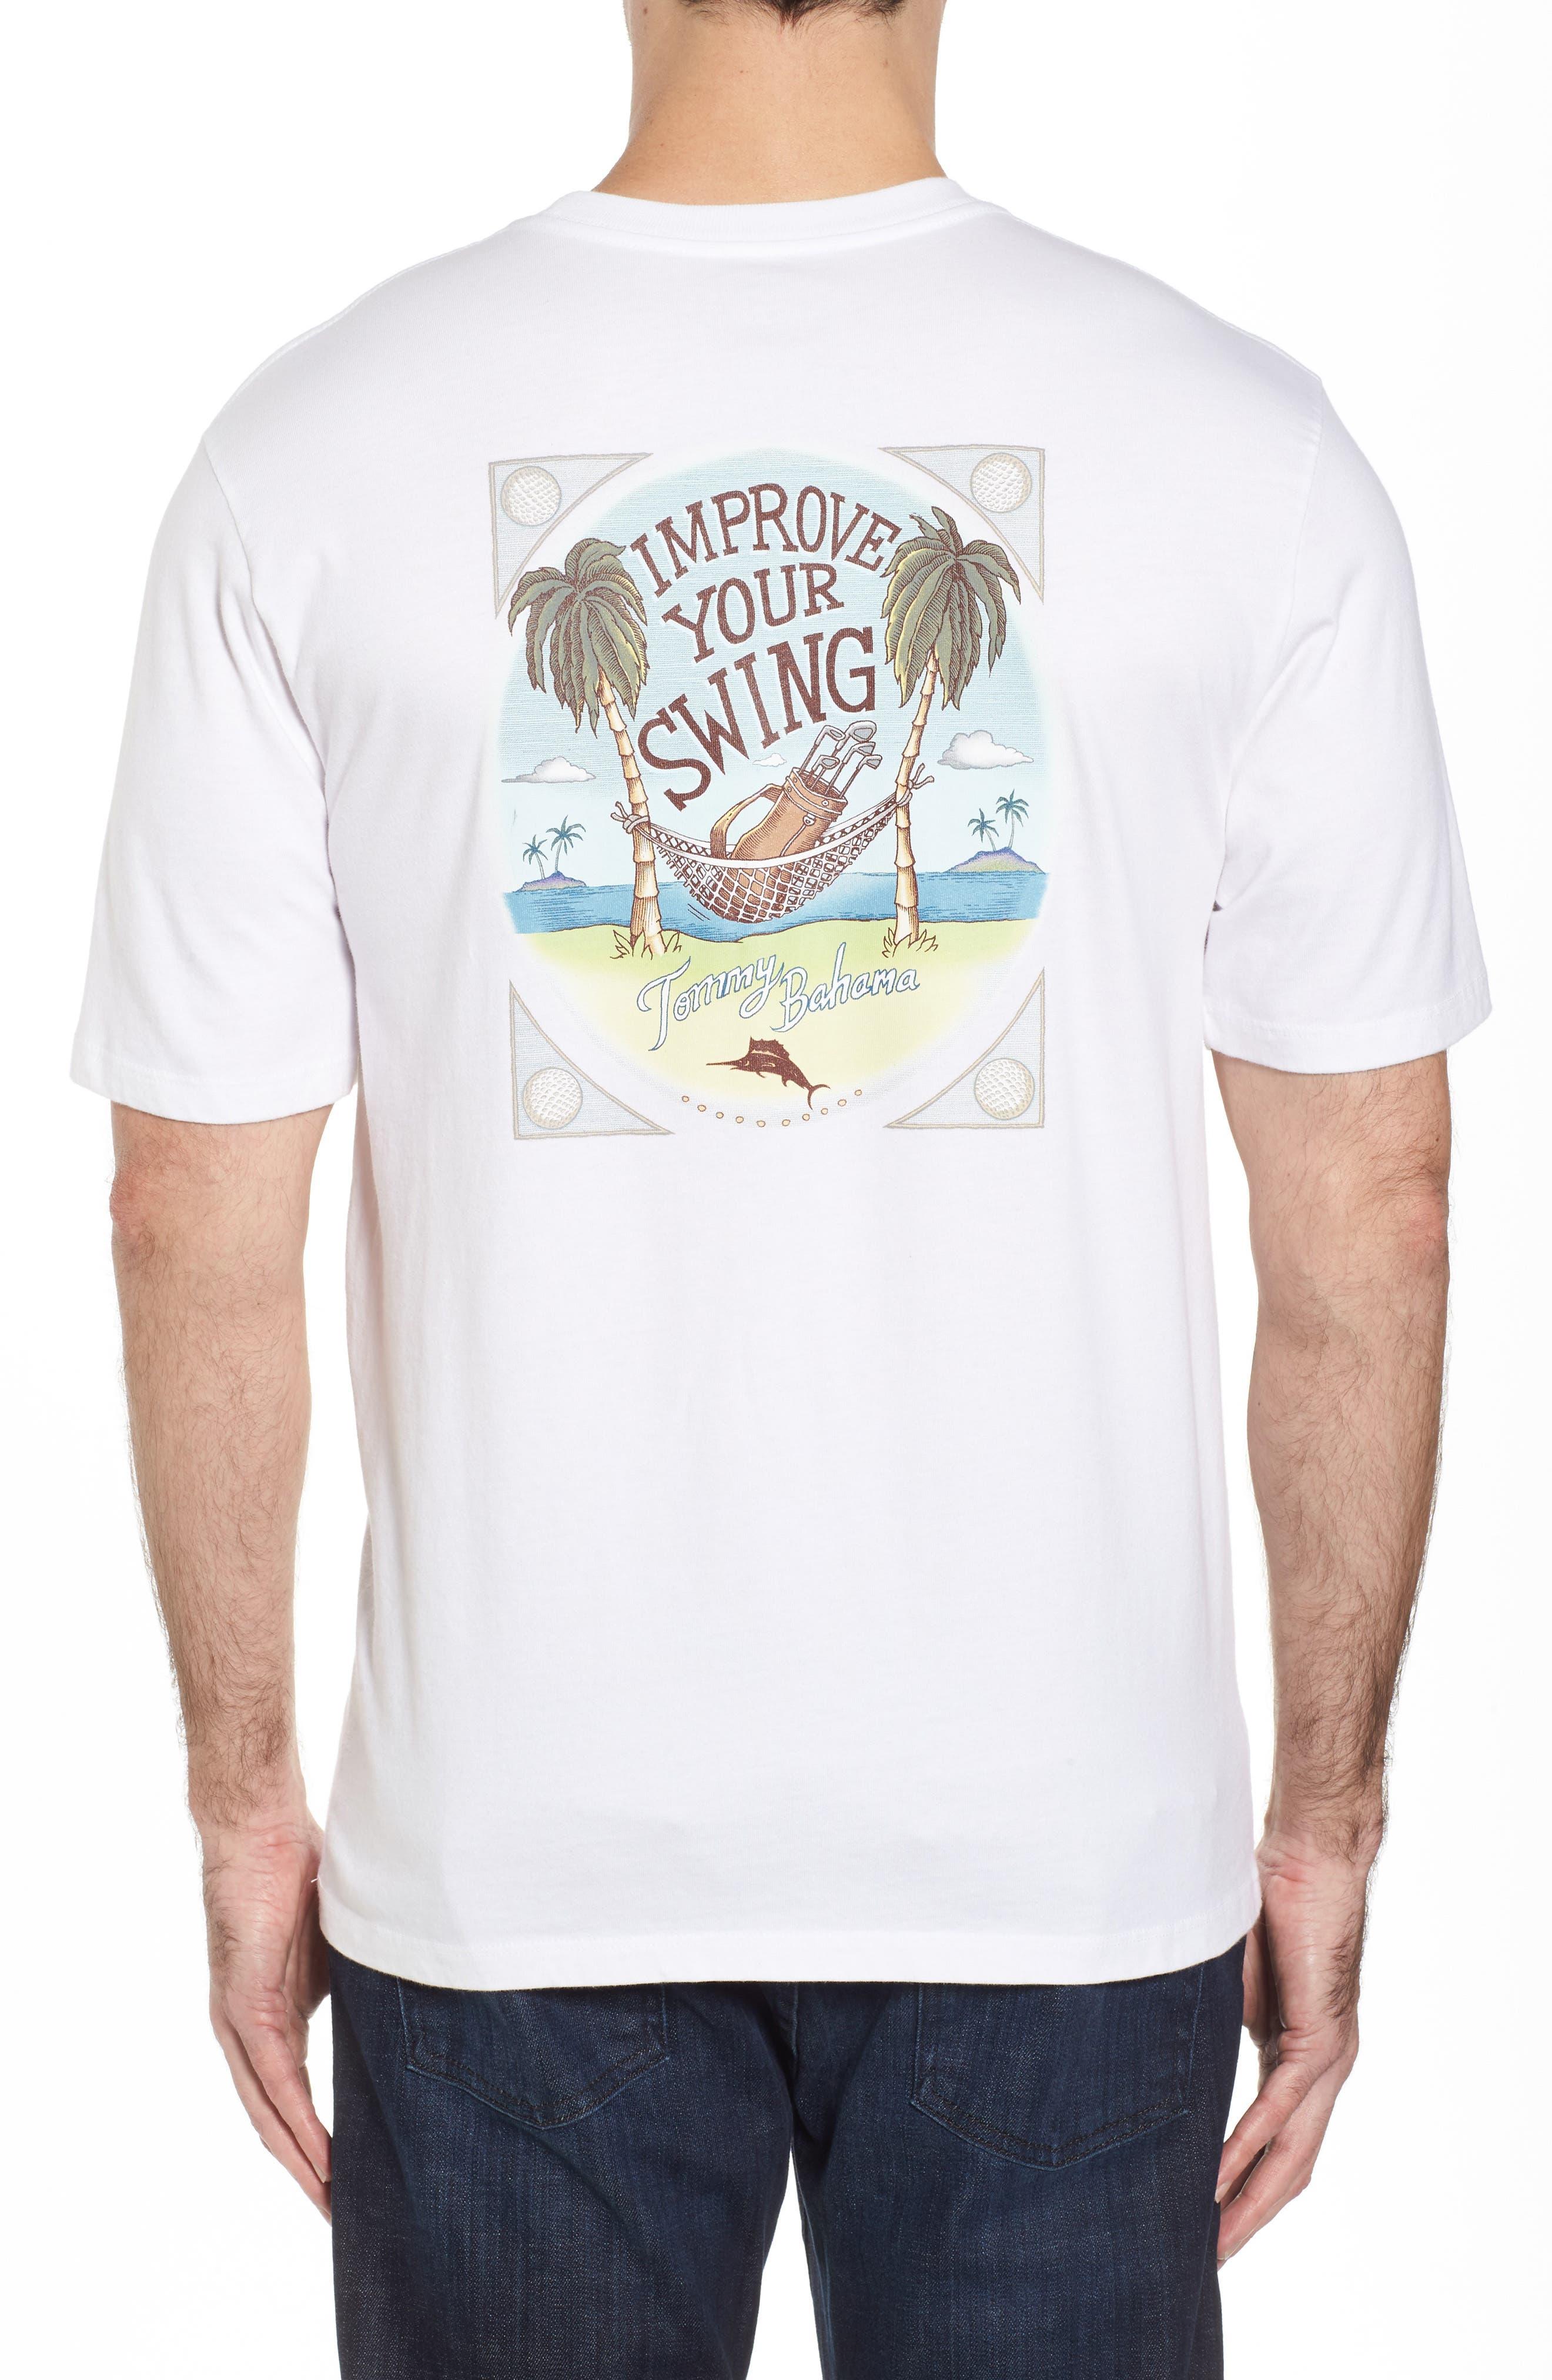 Improve Your Swing T-Shirt,                             Alternate thumbnail 2, color,                             100